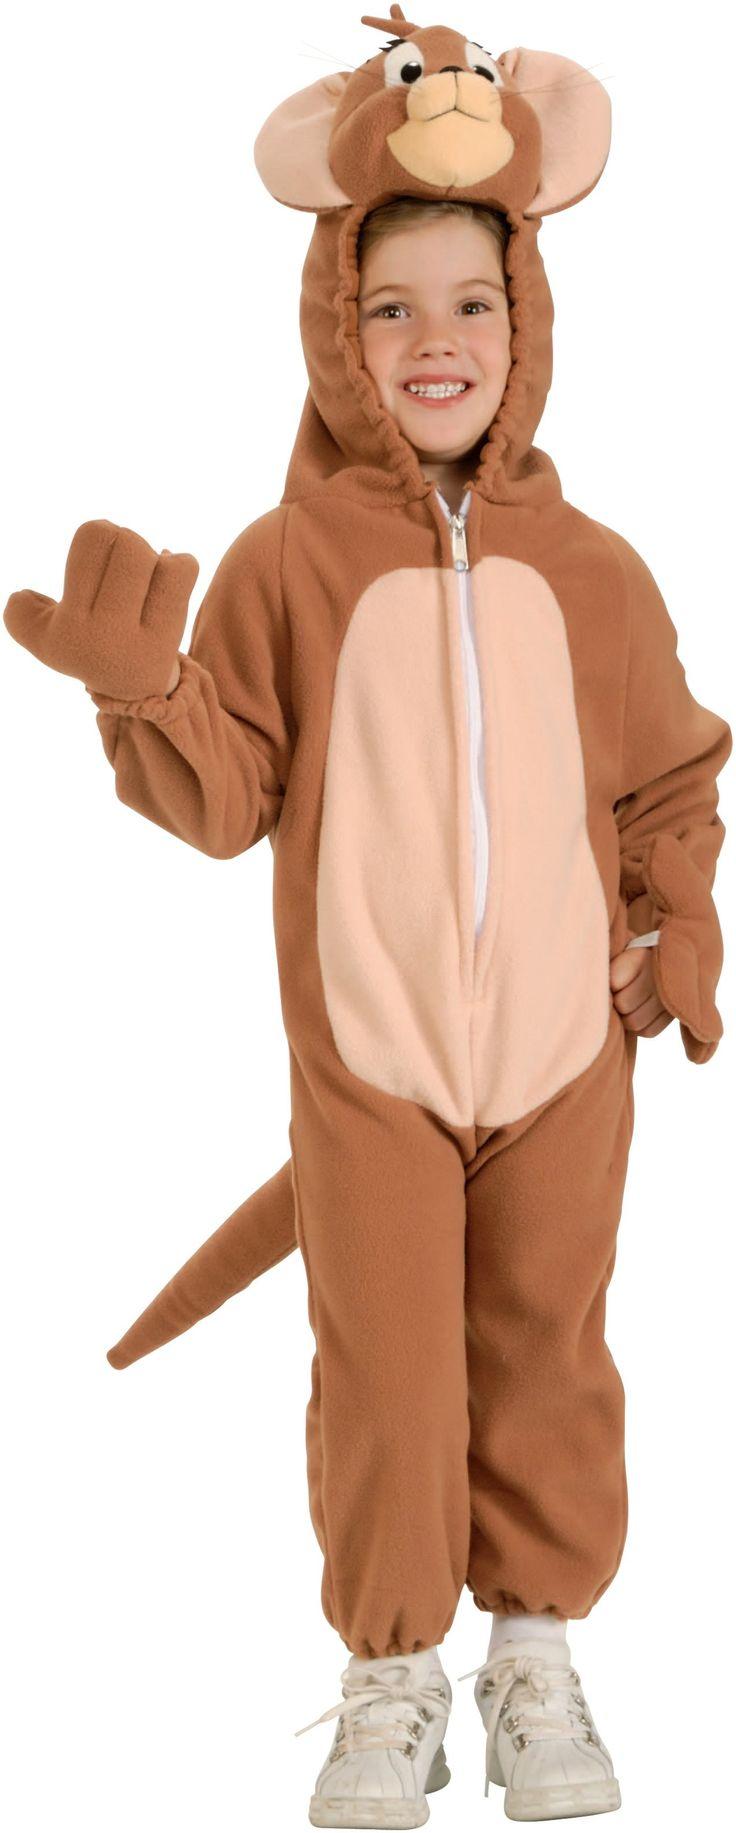 tom u0026 jerry jerry child costume costume includes fleece jumpsuit with easy release zipper costumes kidscheap halloween